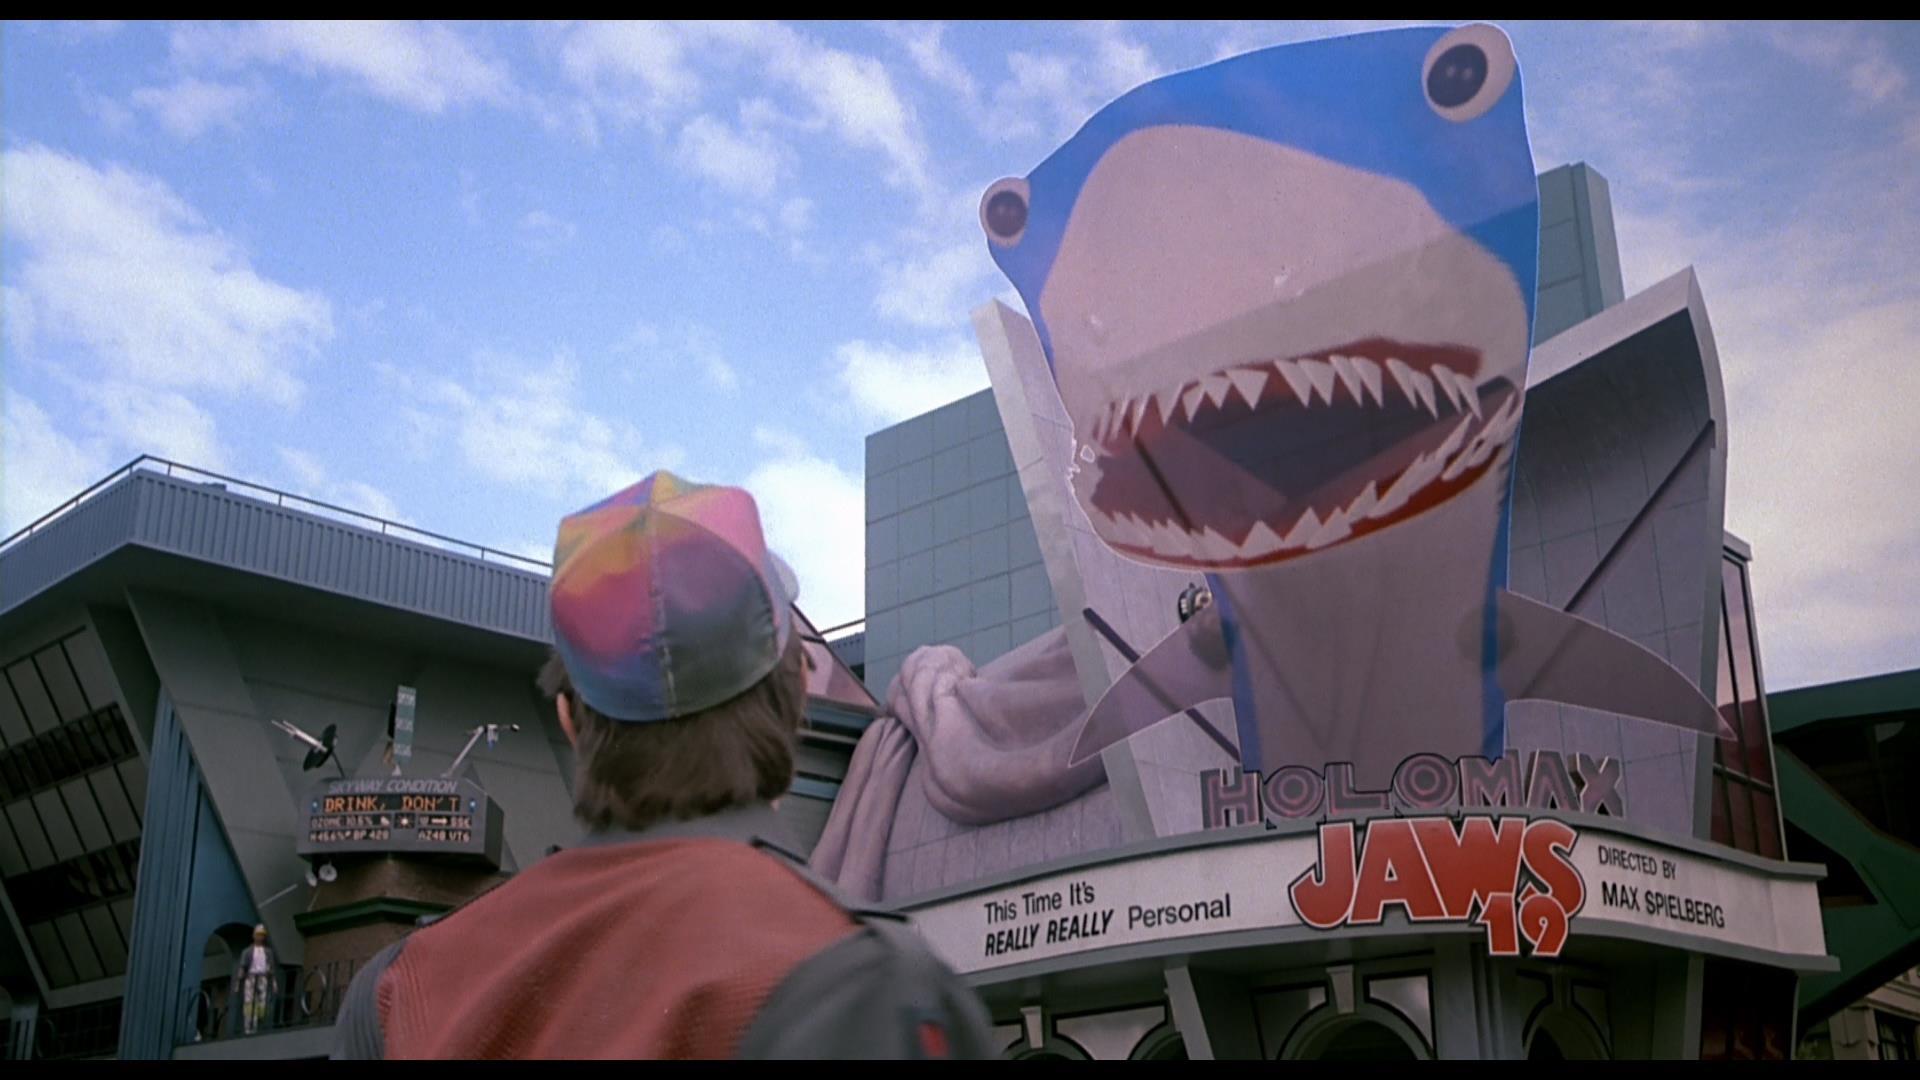 BTTF2 - Jaws 19 Holomax